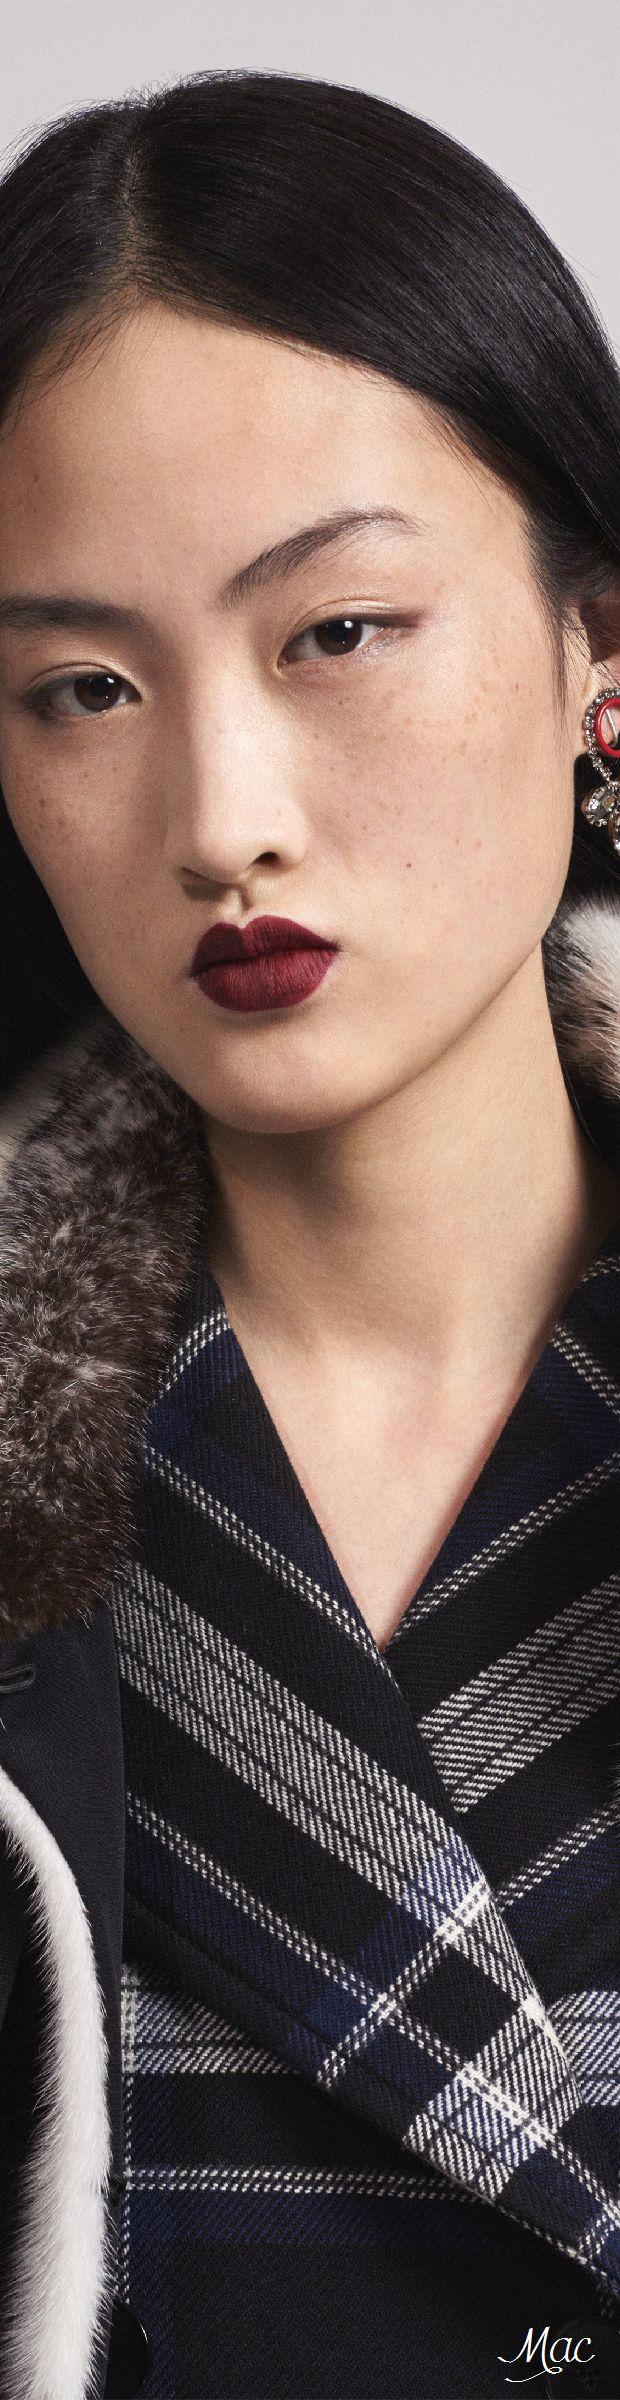 Pre-Fall 2016 Christian Dior